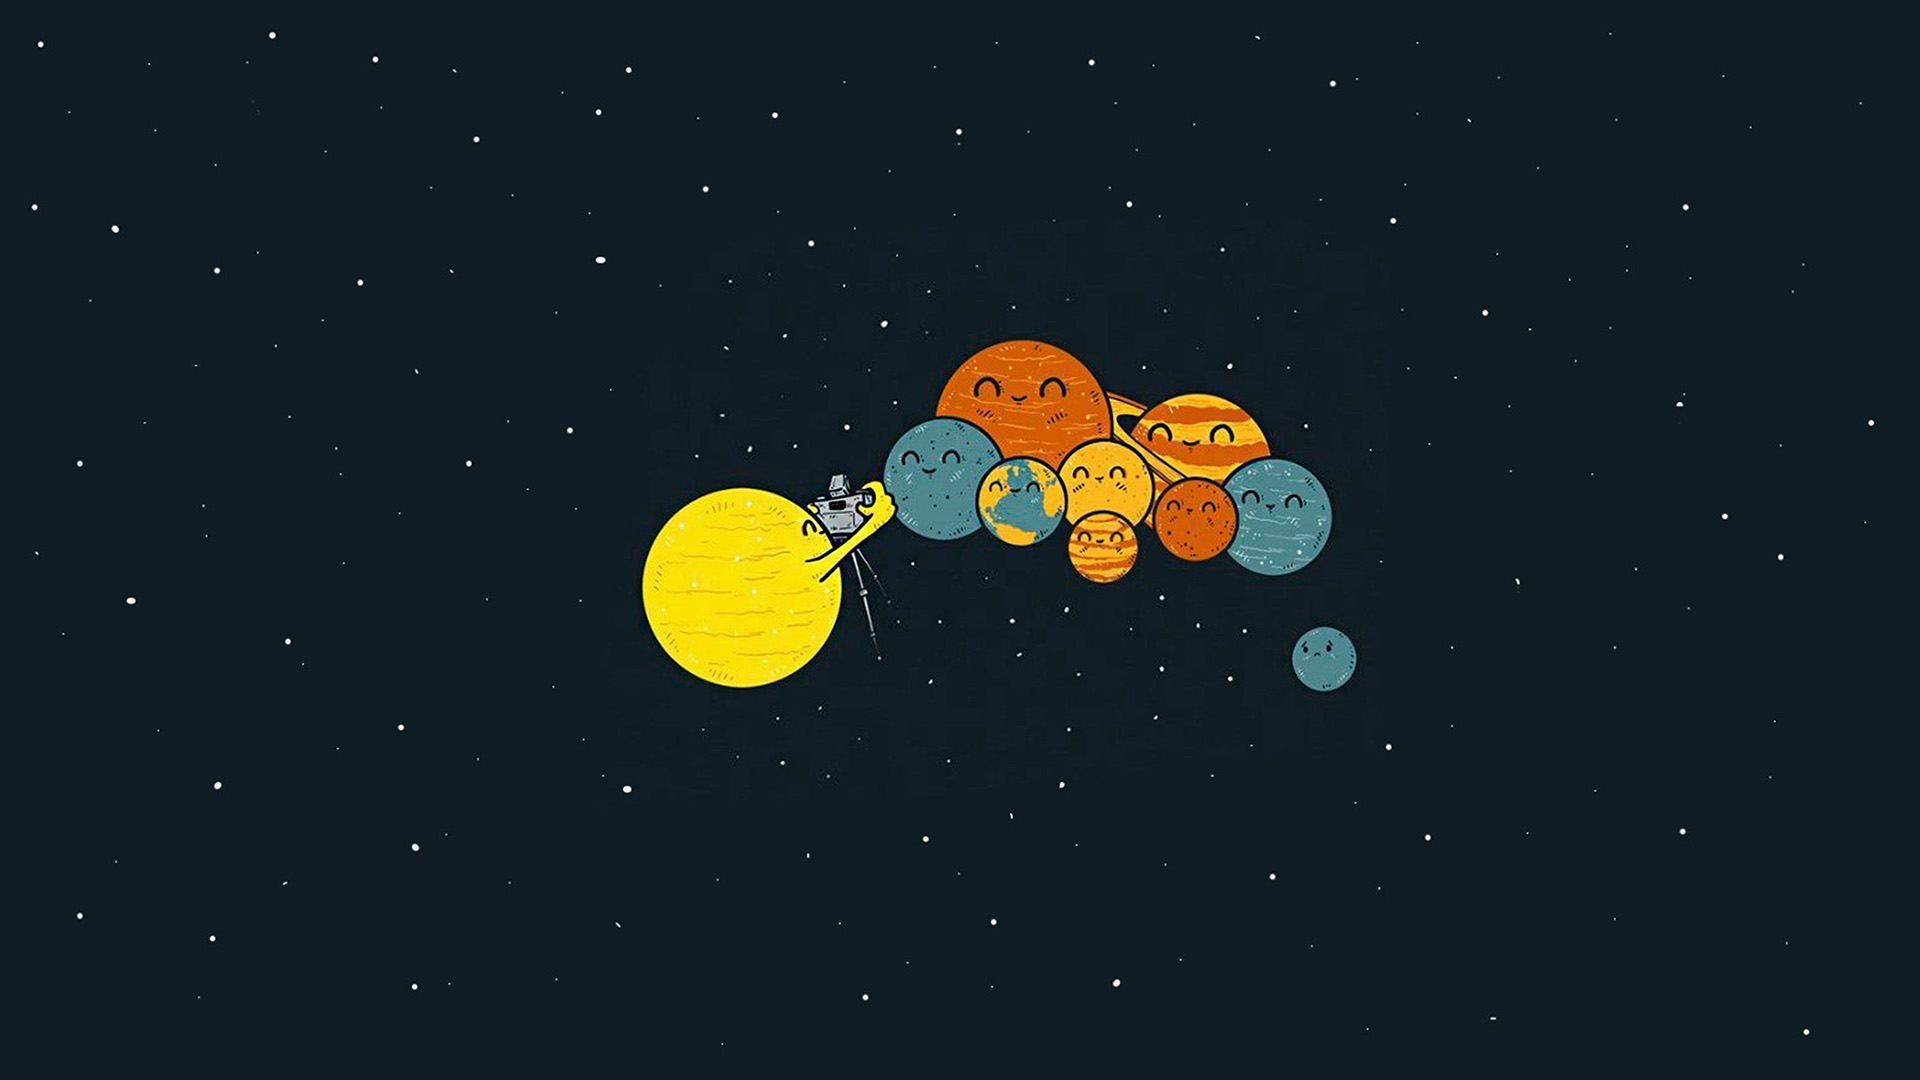 Wallpaper For Desktop Laptop Ar48 Planets Cute